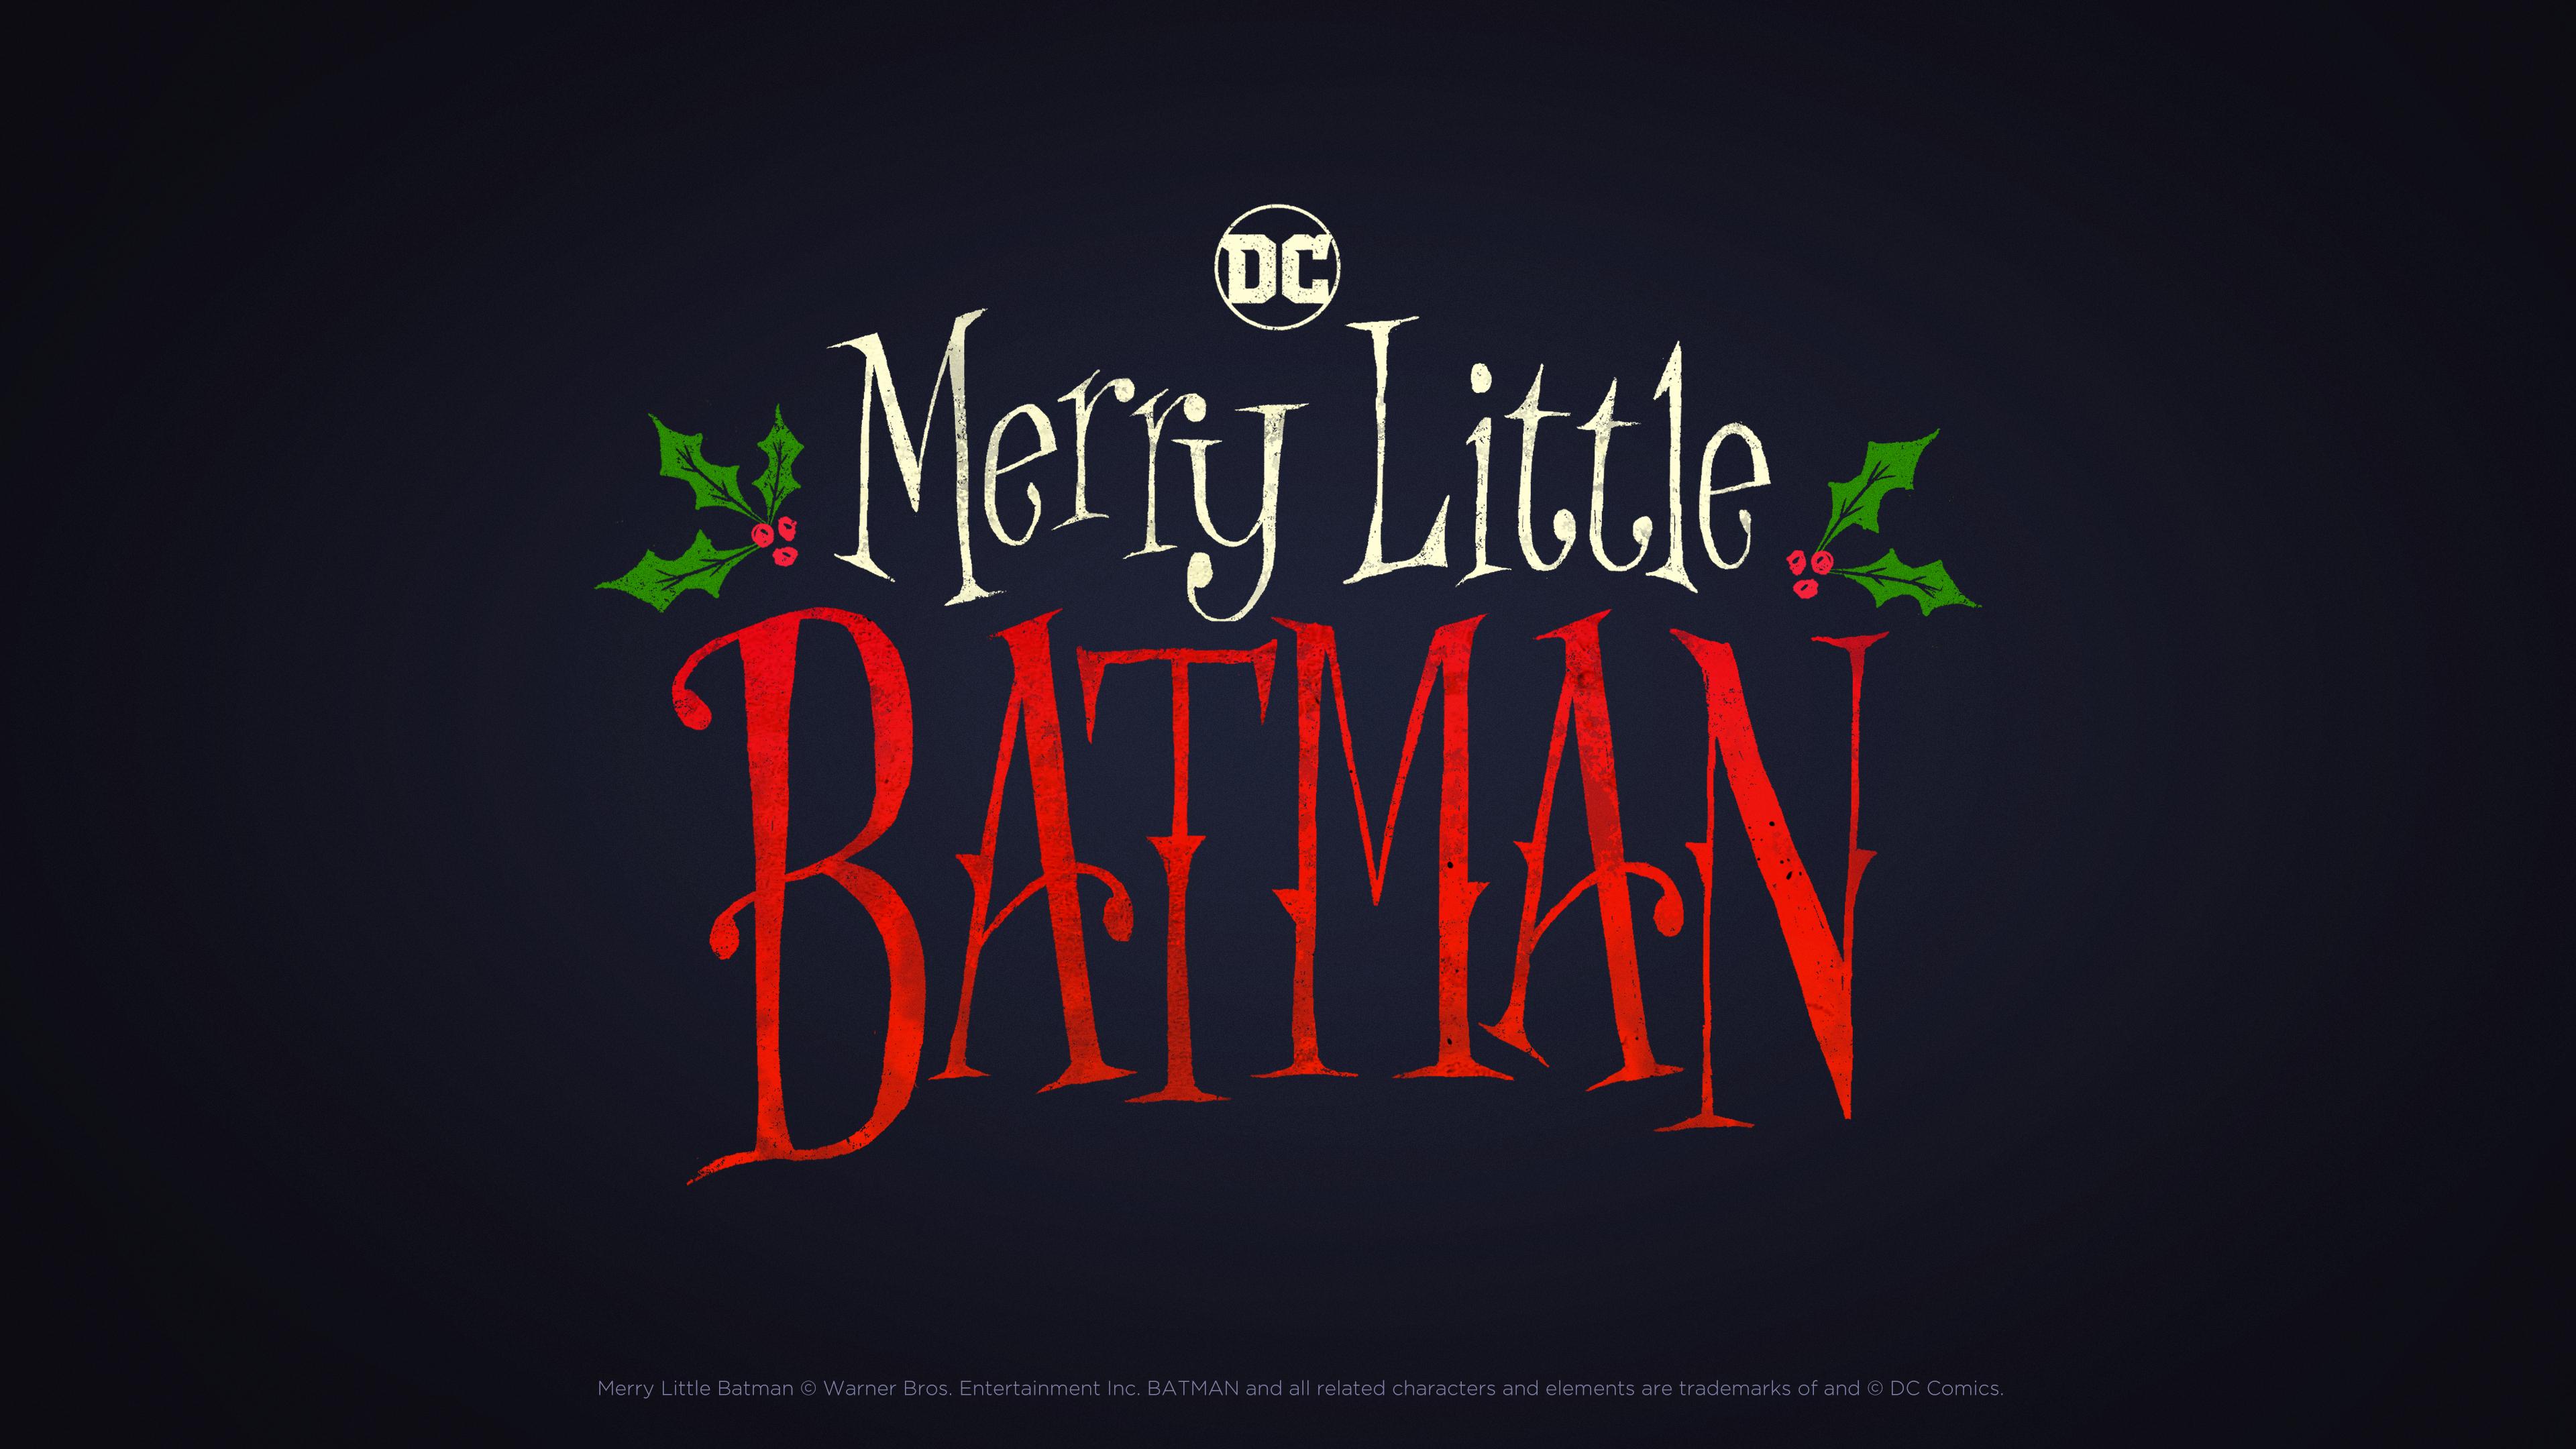 Merry Little Batman Image